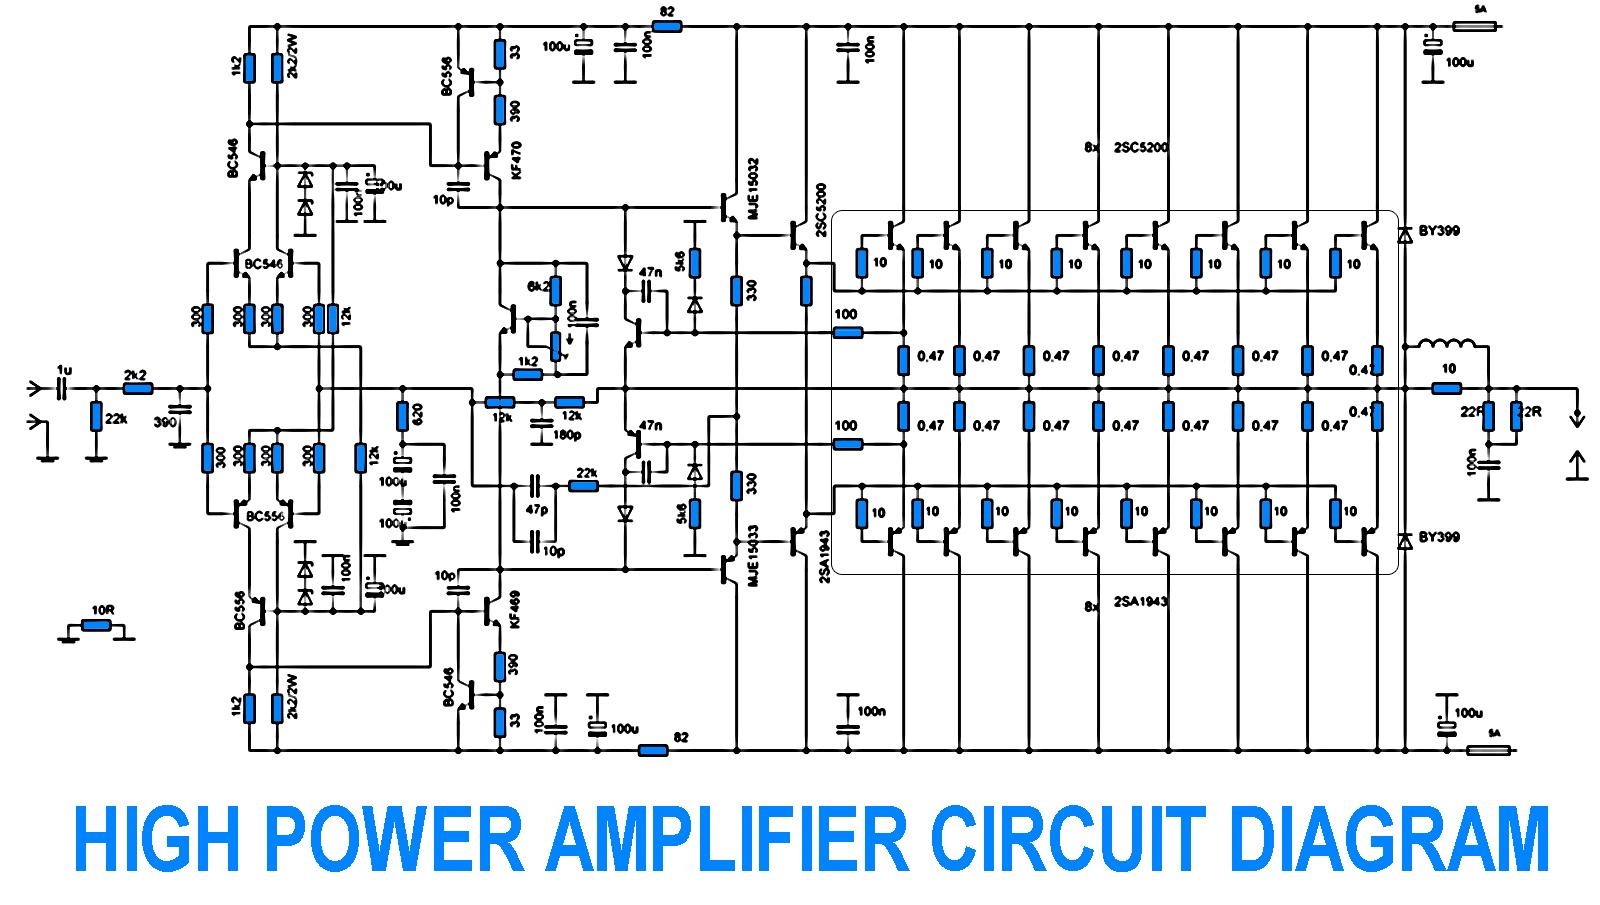 medium resolution of 2sc5200 2sa1943 amplifier circuit 700w power amplifier with 2sc5200 2sa1943 2sc5200 2sa1943 amplifier circuit